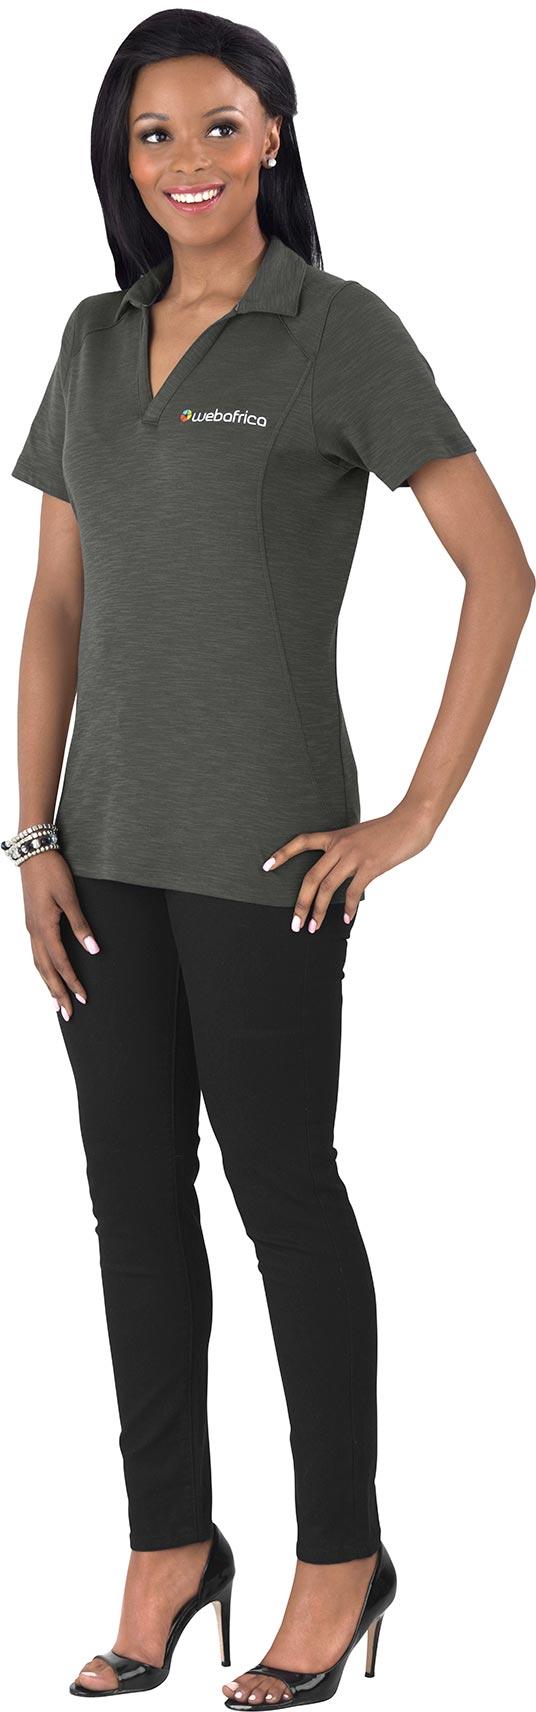 Elevate Jepson Ladies Golf Shirt